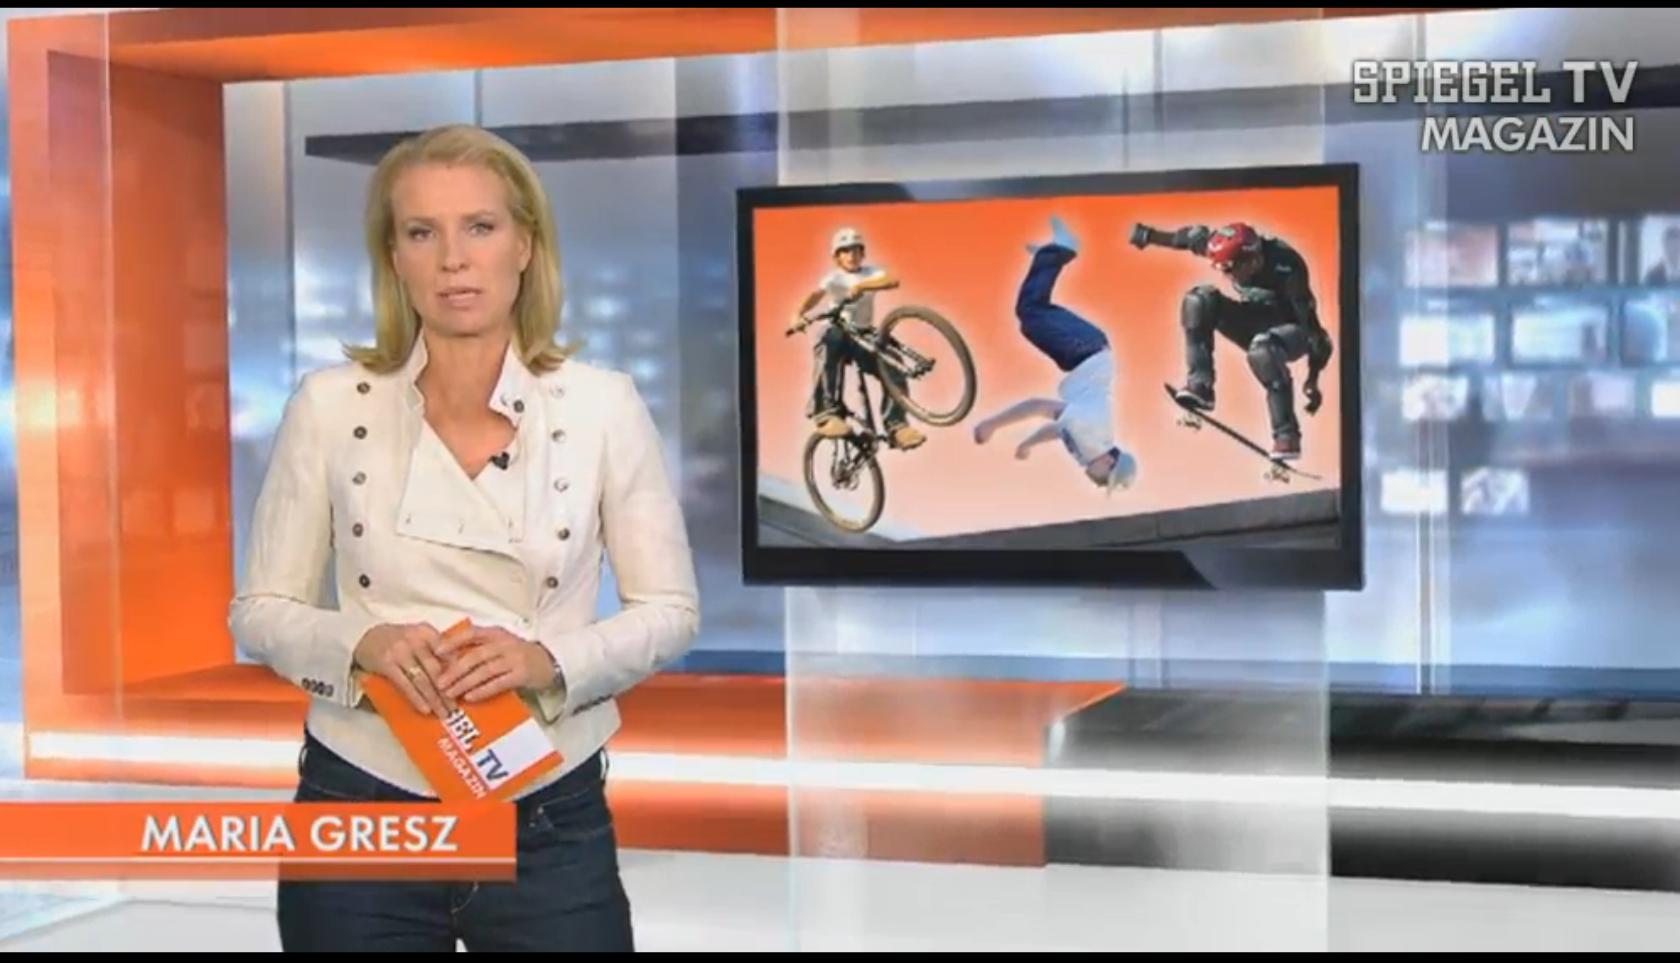 Spiegel tv mit fragw rdigem beitrag ber den downhill for Spiegel tv news